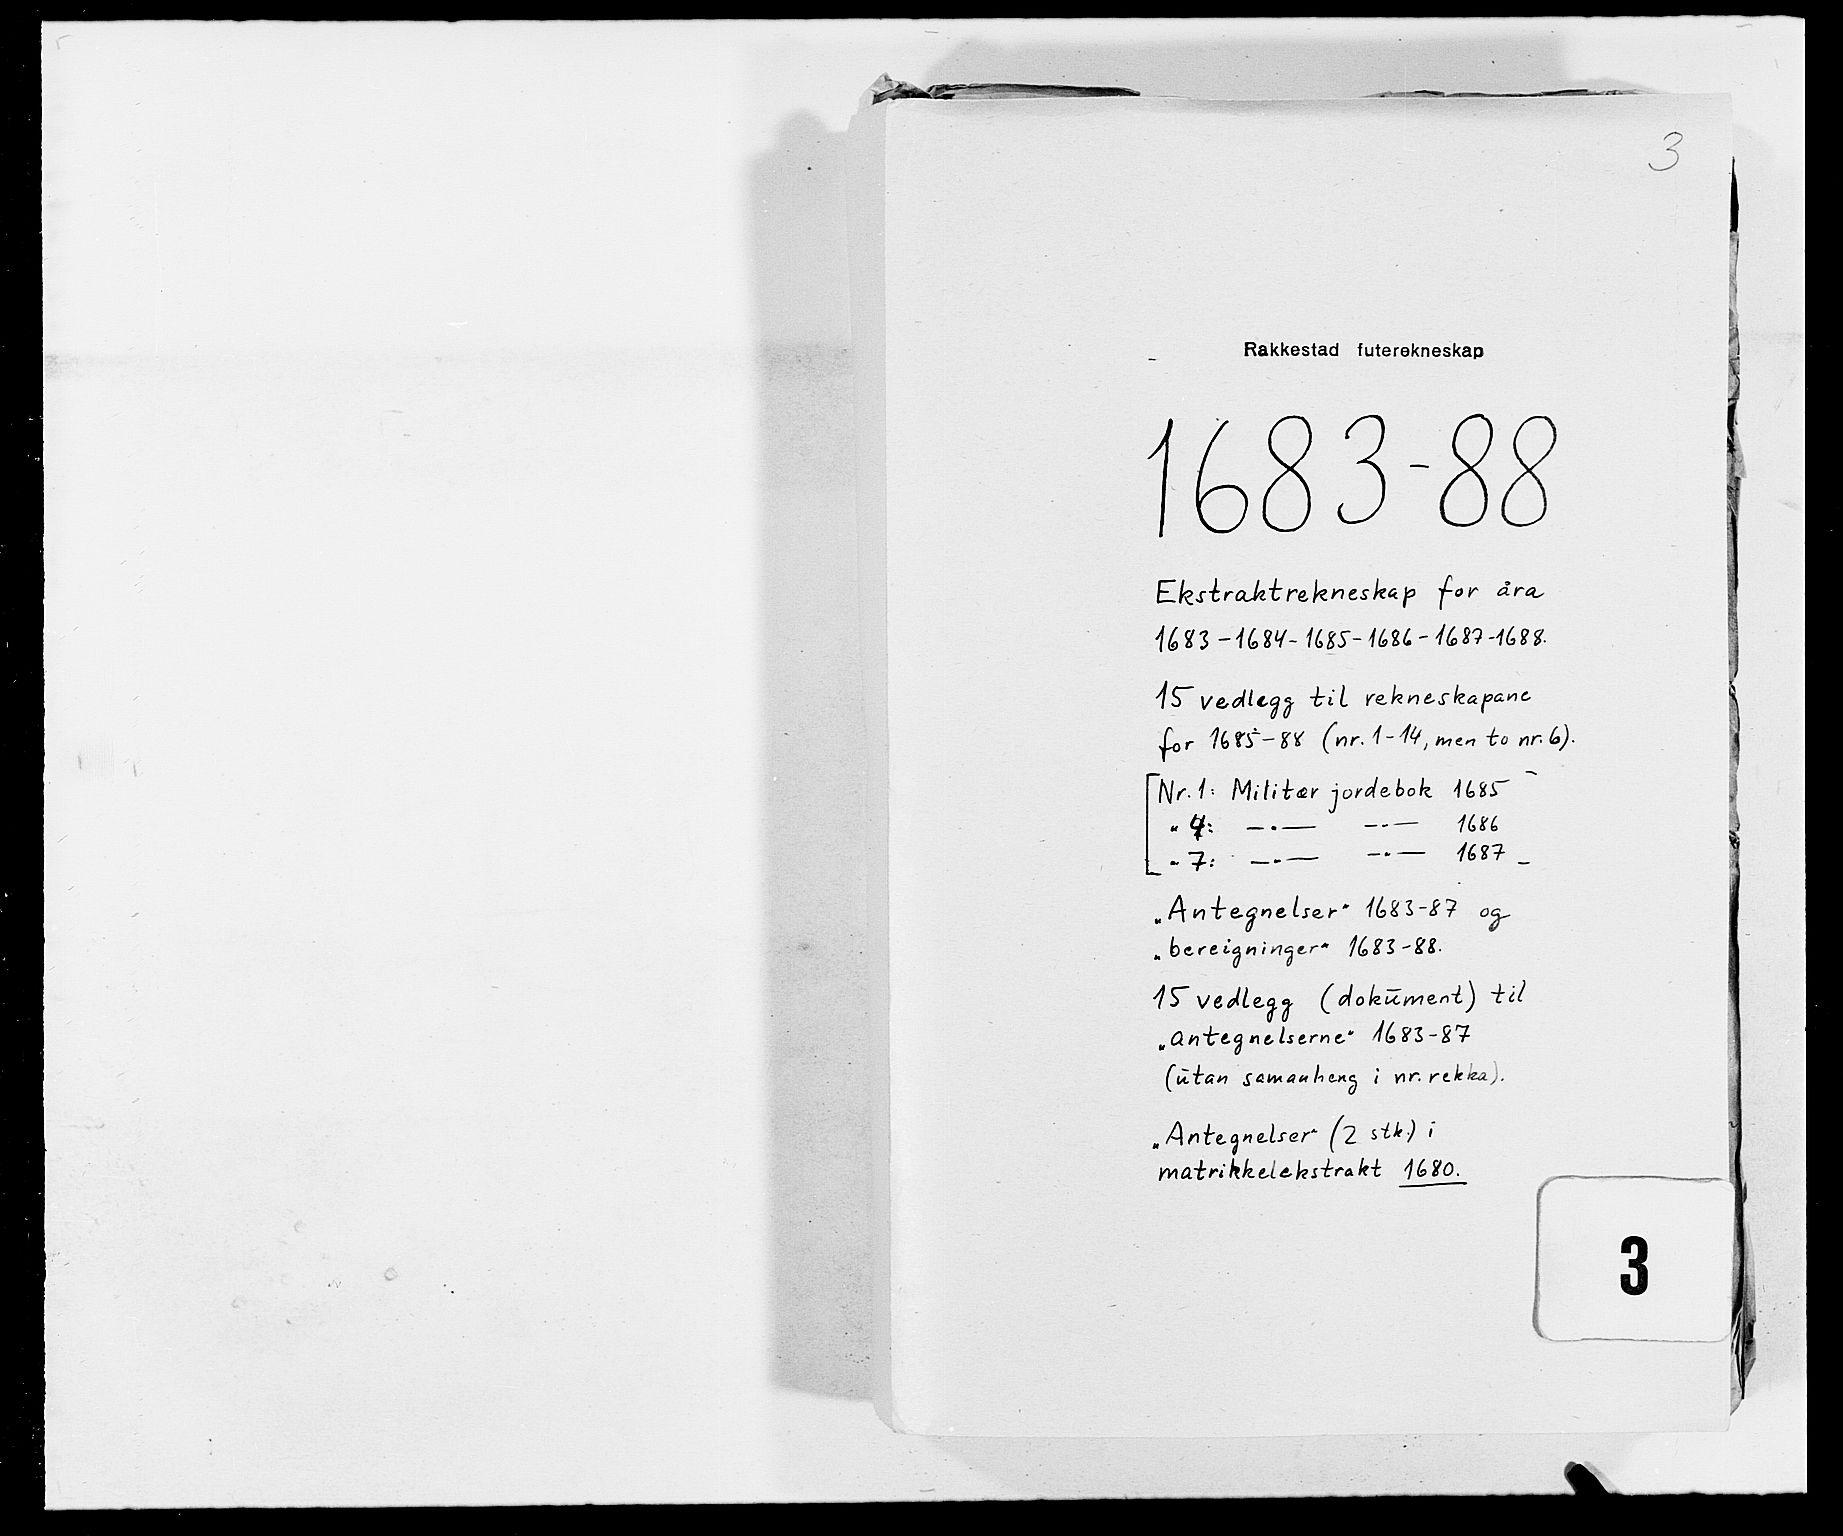 RA, Rentekammeret inntil 1814, Reviderte regnskaper, Fogderegnskap, R05/L0276: Fogderegnskap Rakkestad, 1683-1688, s. 247